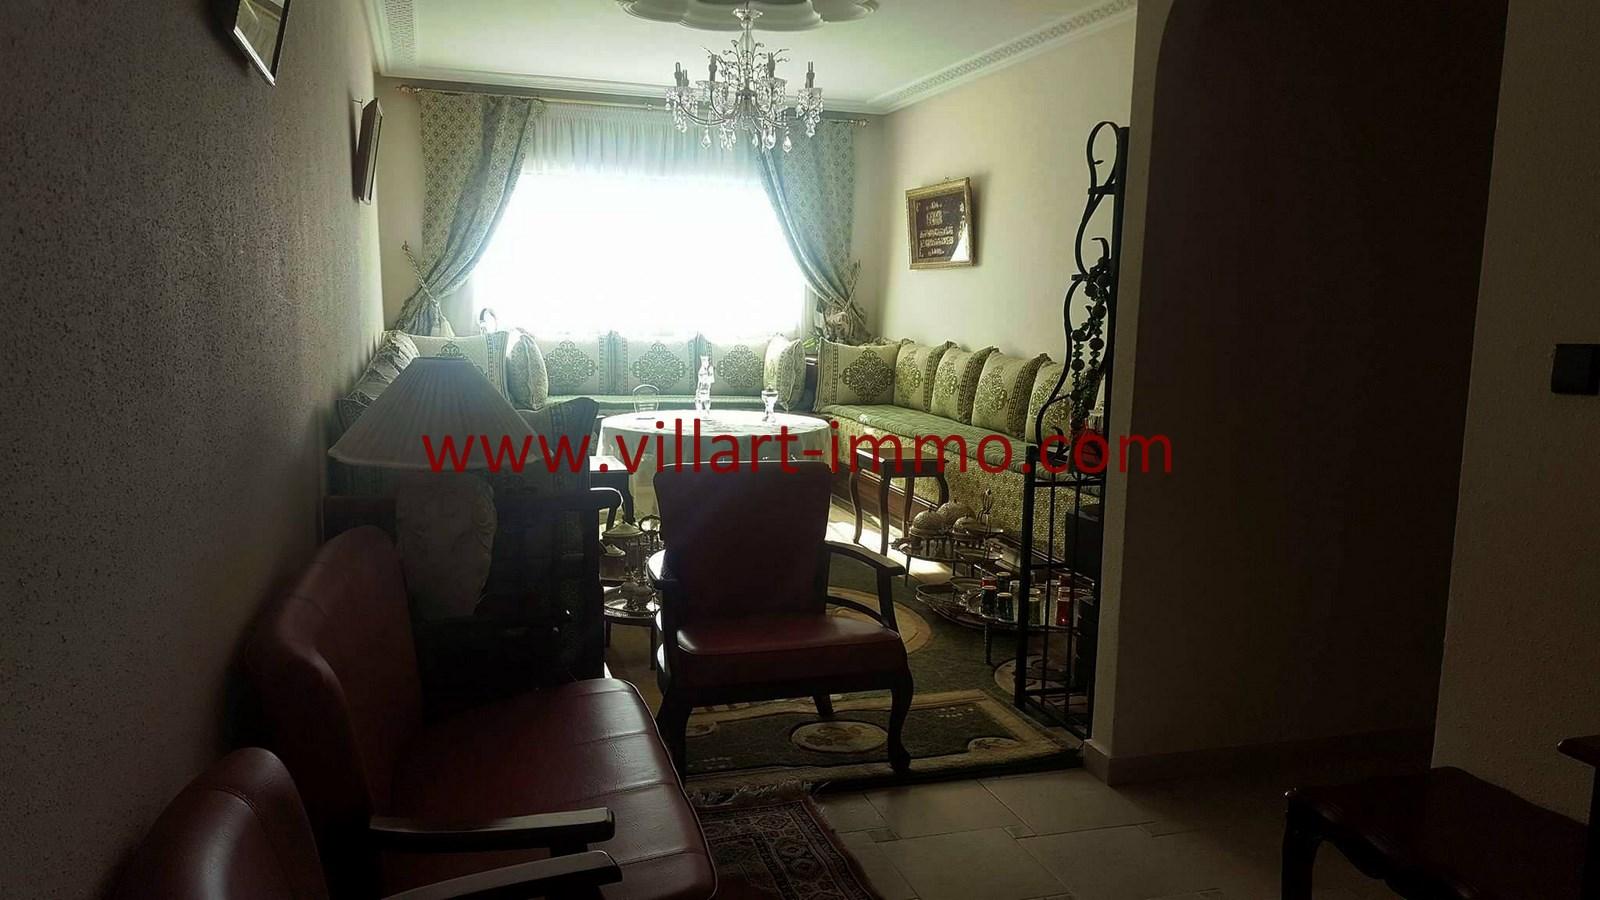 4-Vente-Appartement-Centre-ville-Tanger-Salon-VA531-Villart Immo